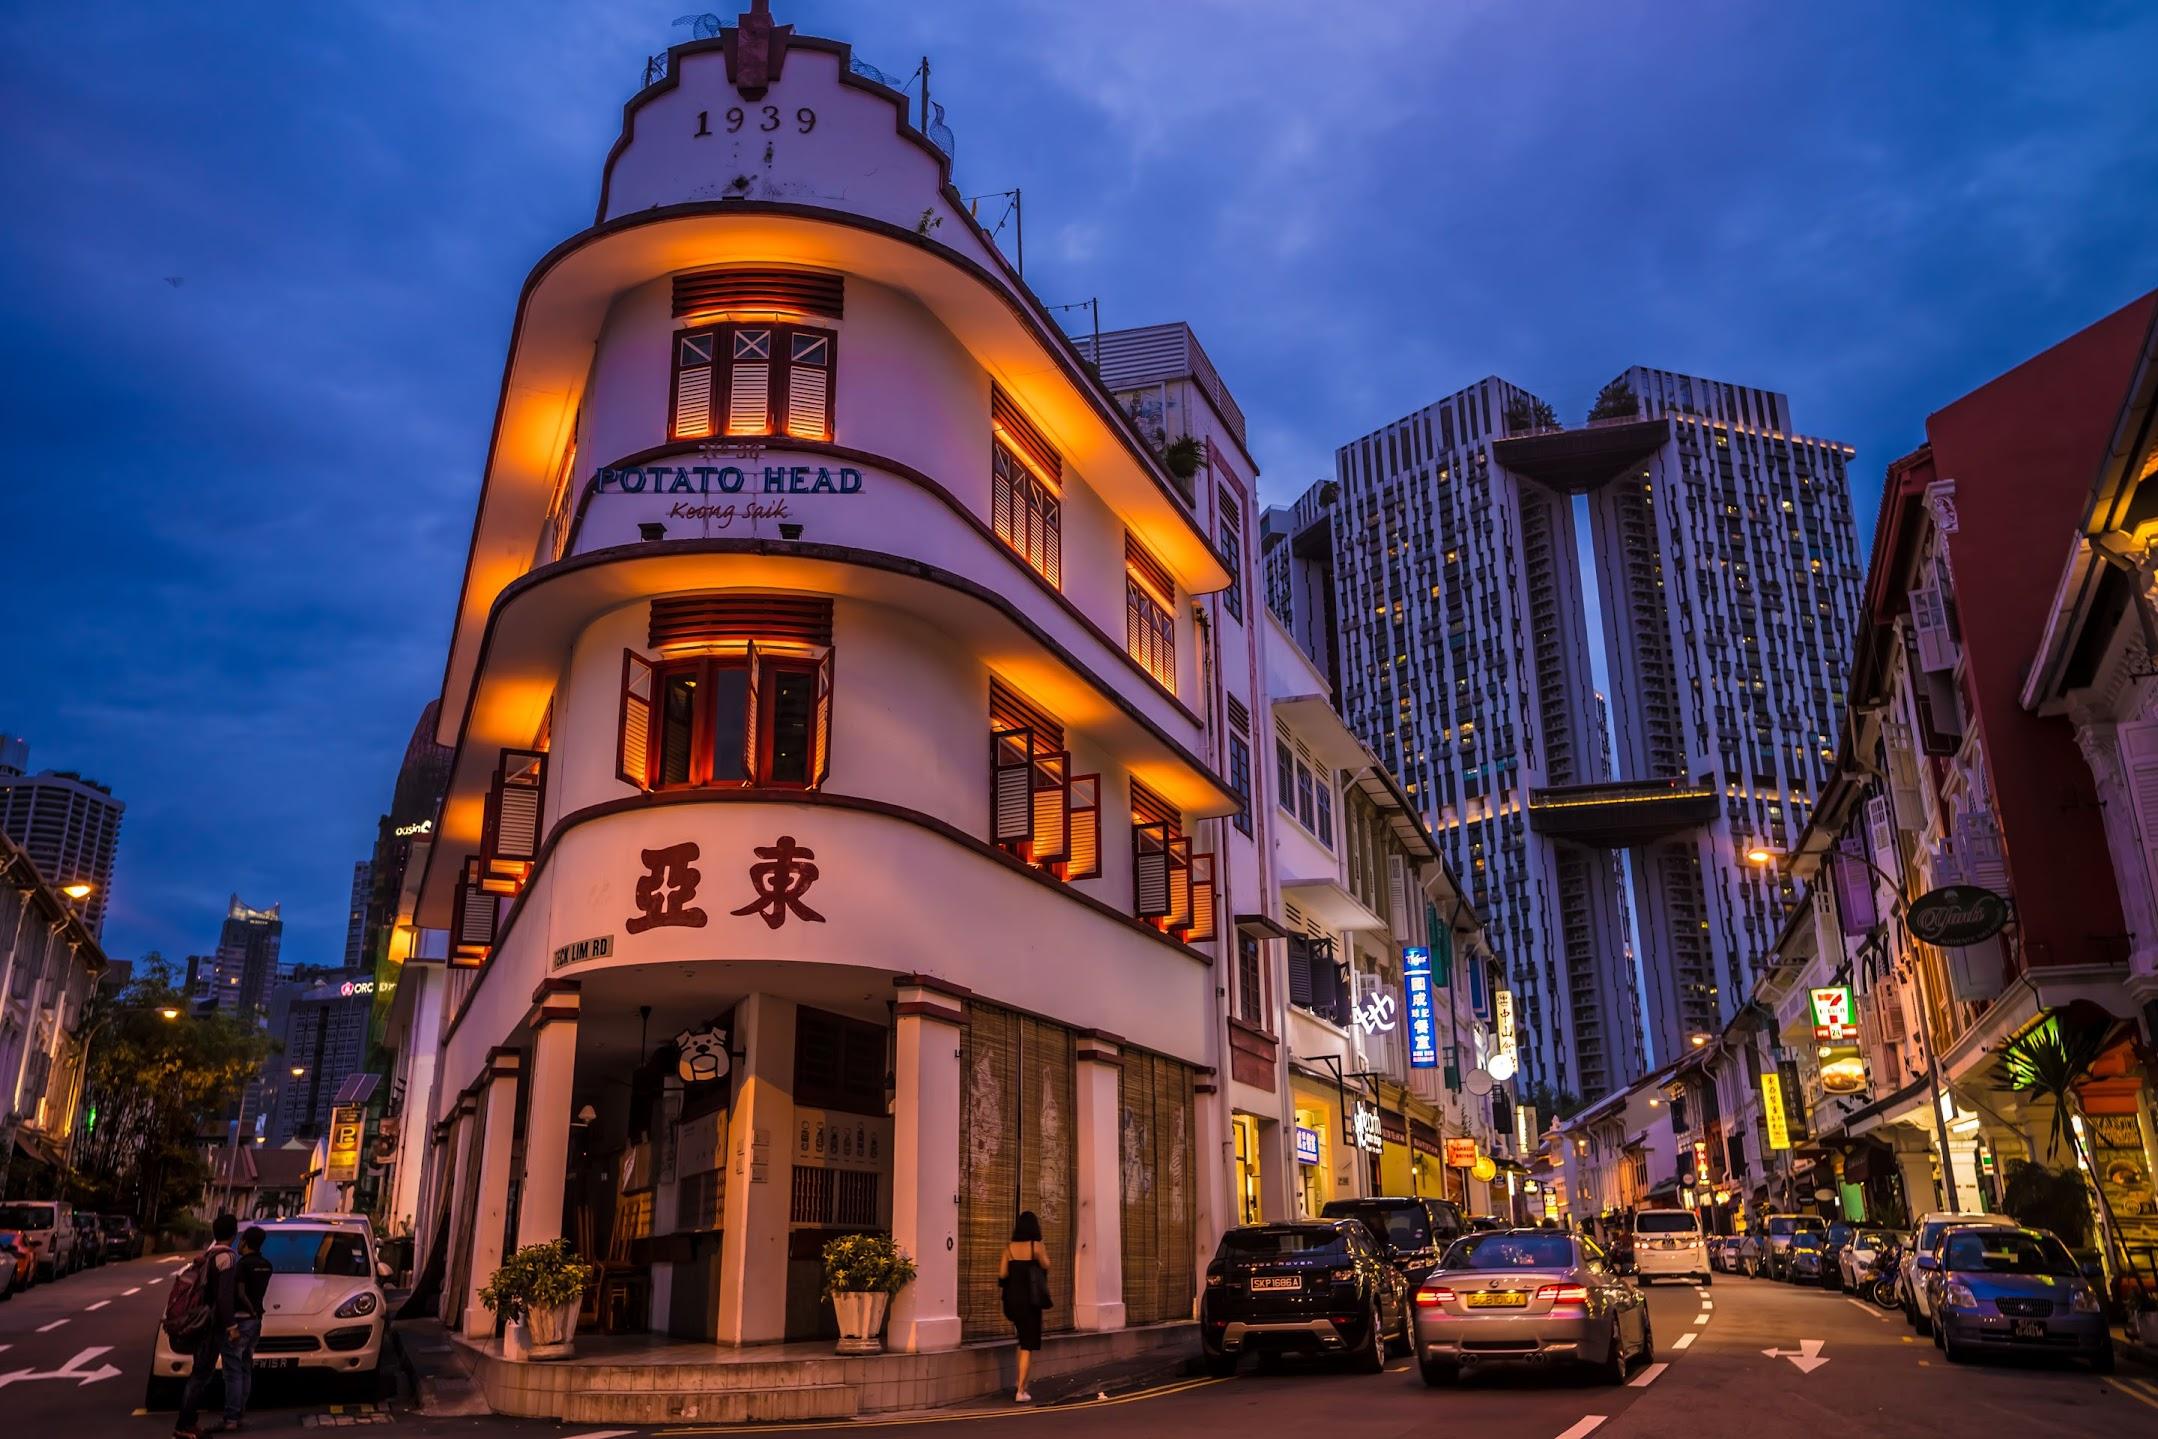 singapore 東亜餐館 (Tong Ah Eating House) ライトアップ